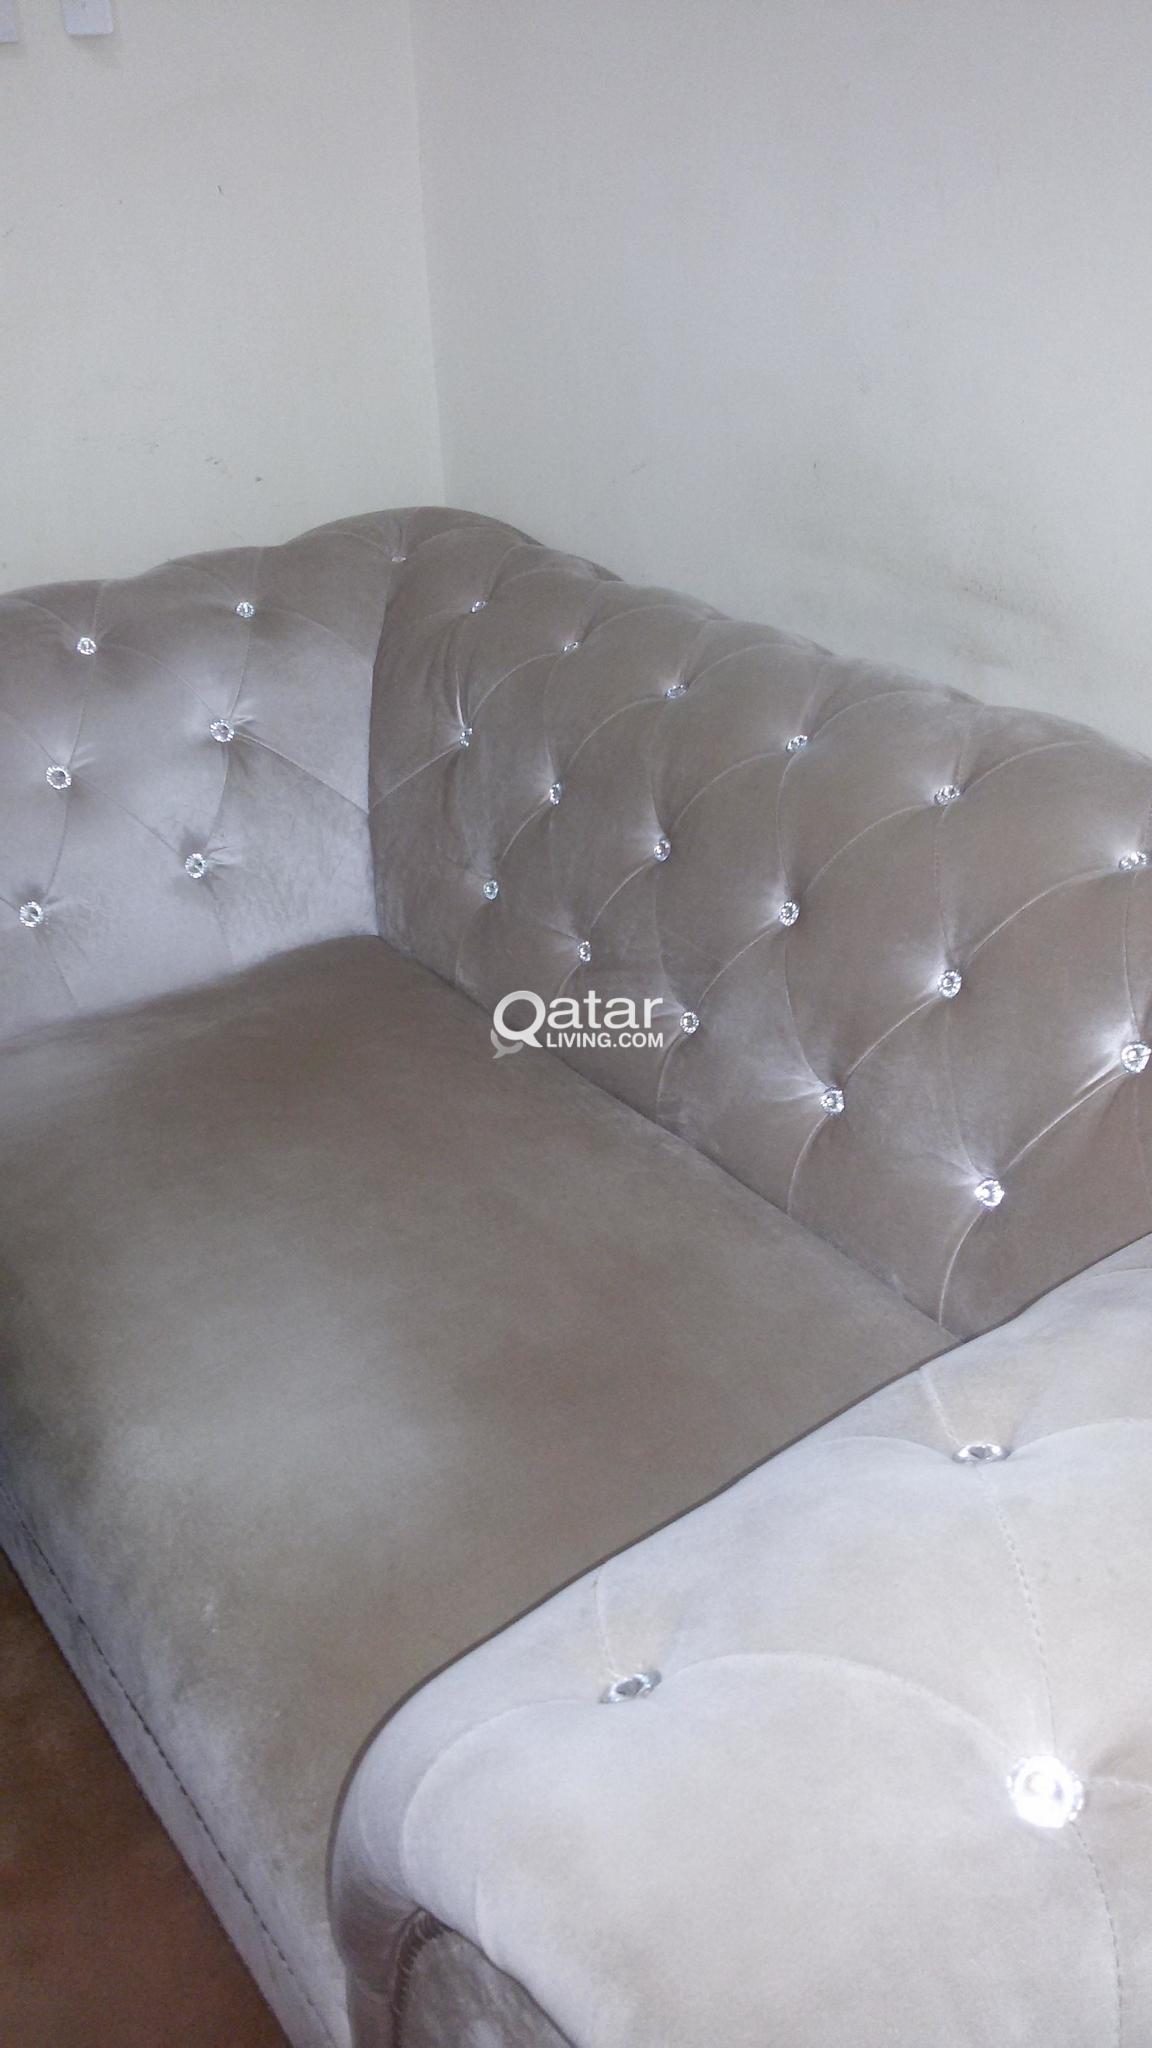 Tremendous Homes R Us Home Center Furniture For Sale Qatar Living Download Free Architecture Designs Intelgarnamadebymaigaardcom